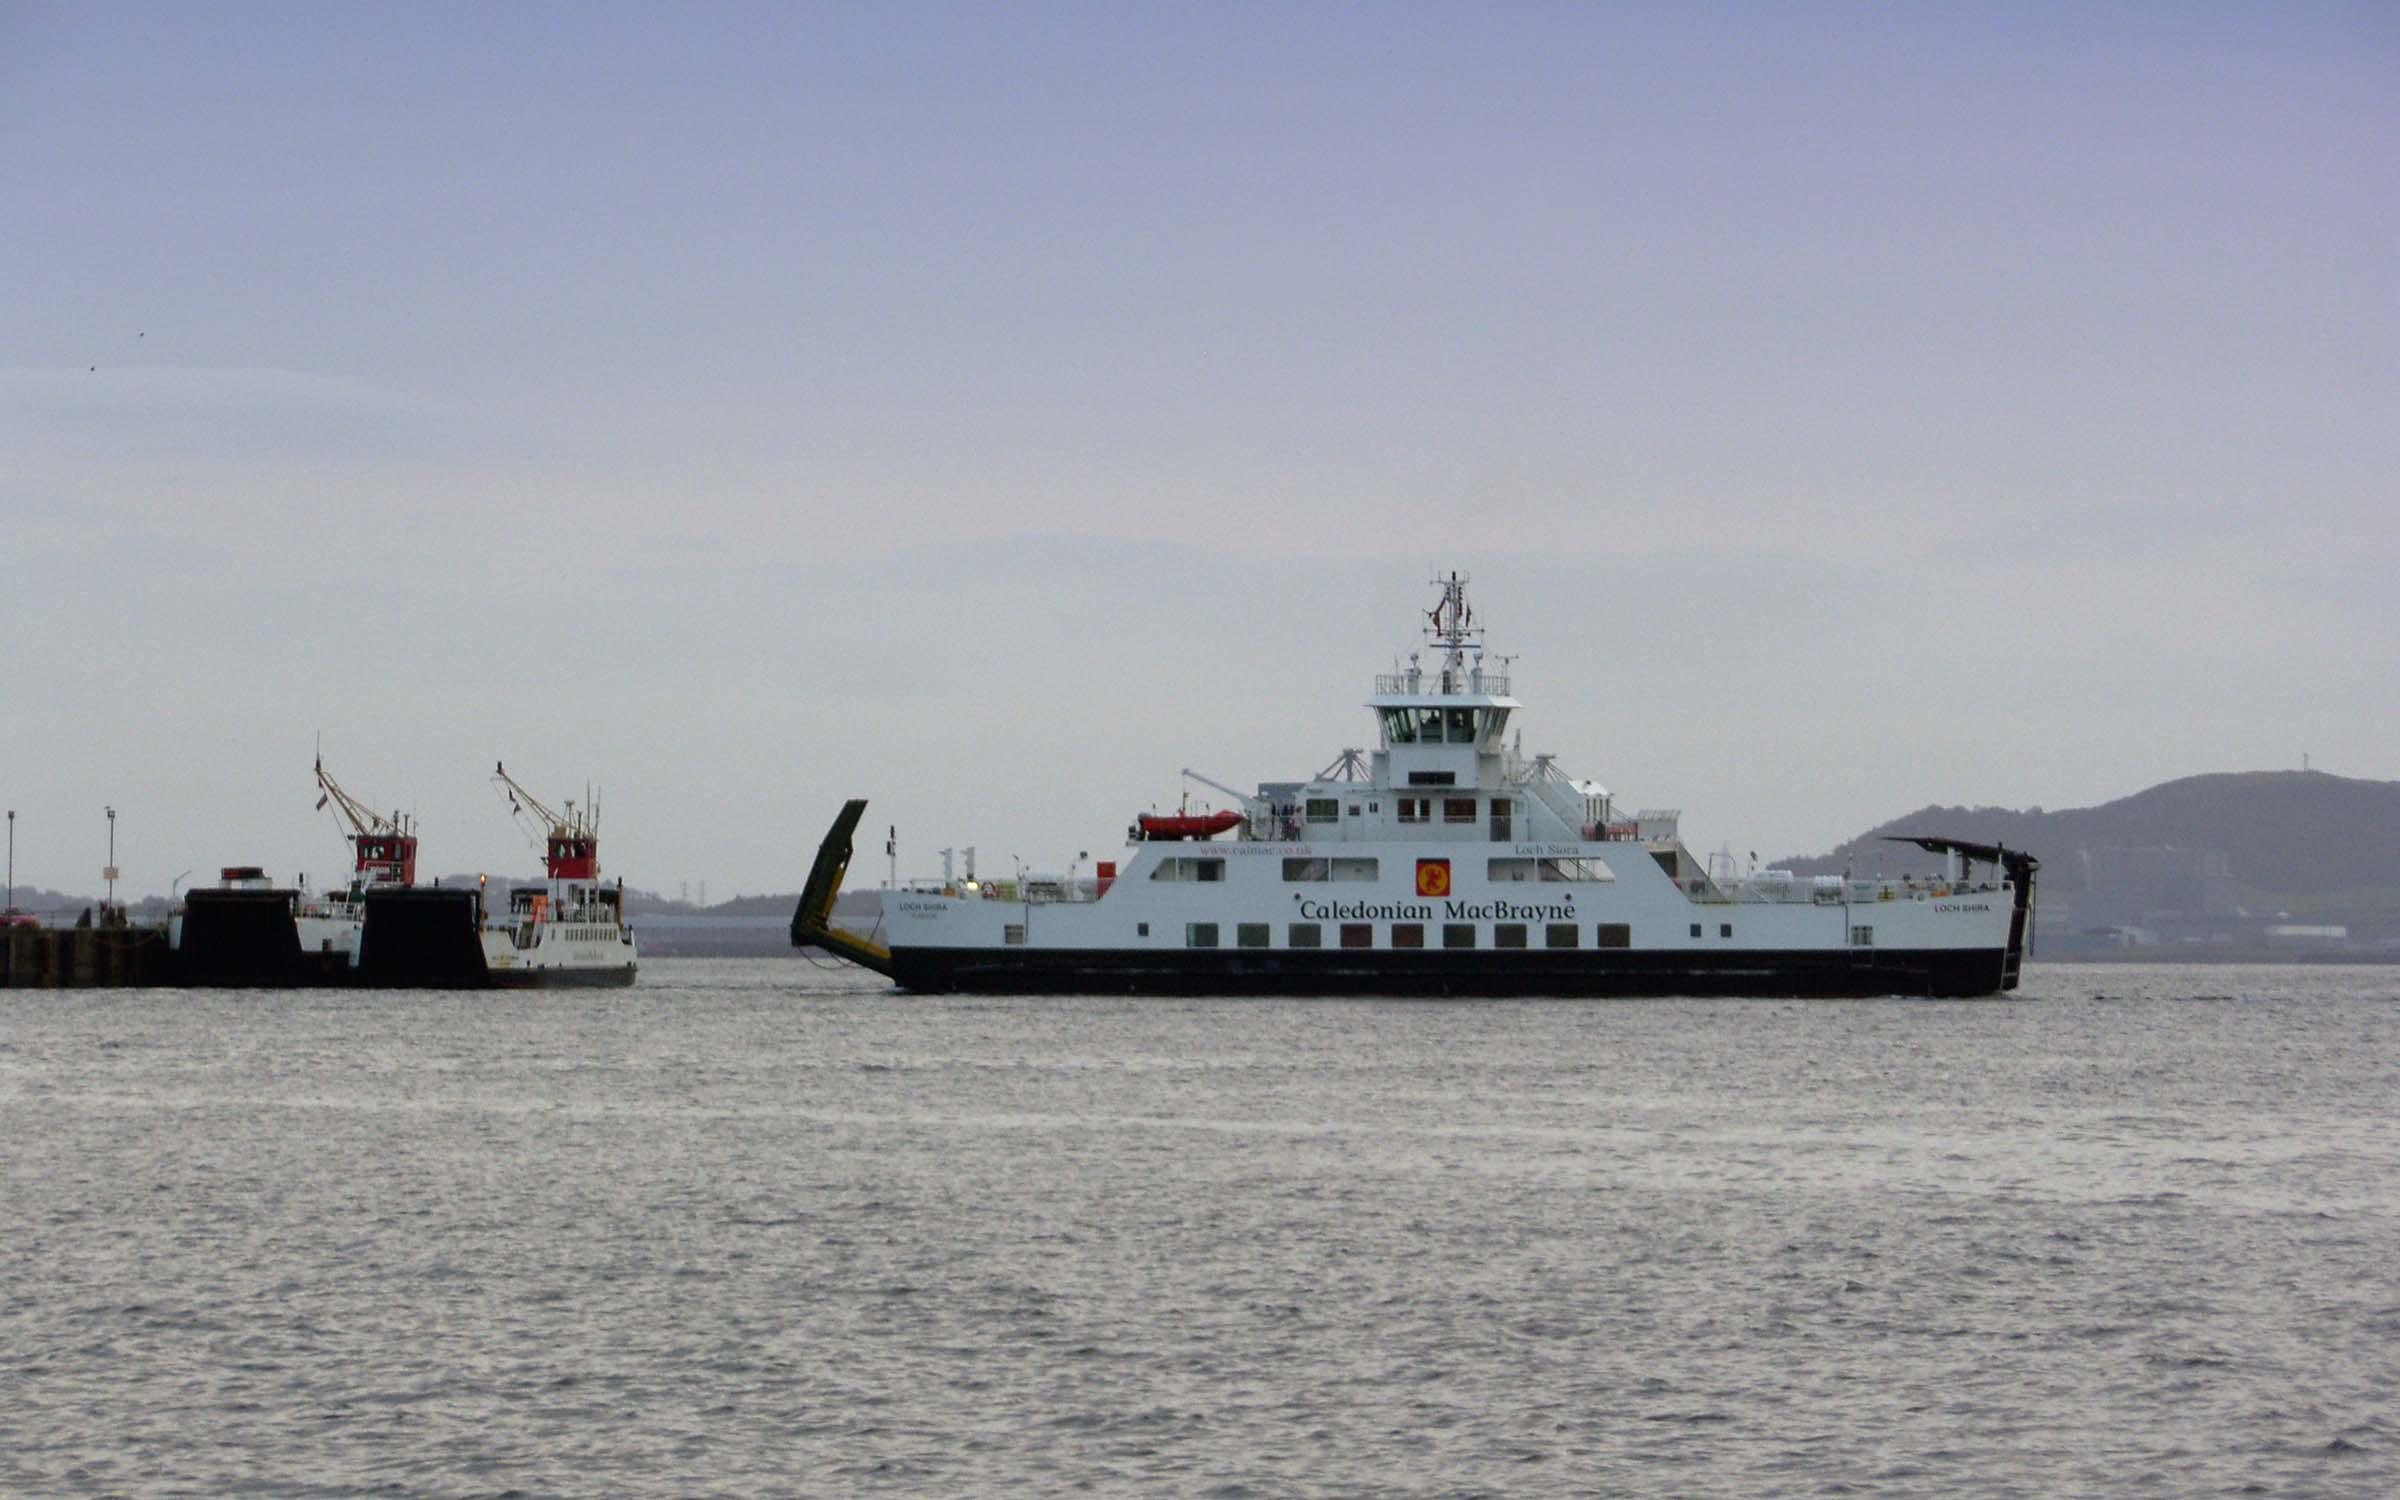 Three generations of Cumbrae ferries: Loch Linnhe, Isle of Cumbrae and Loch Shira (Ships of CalMac)